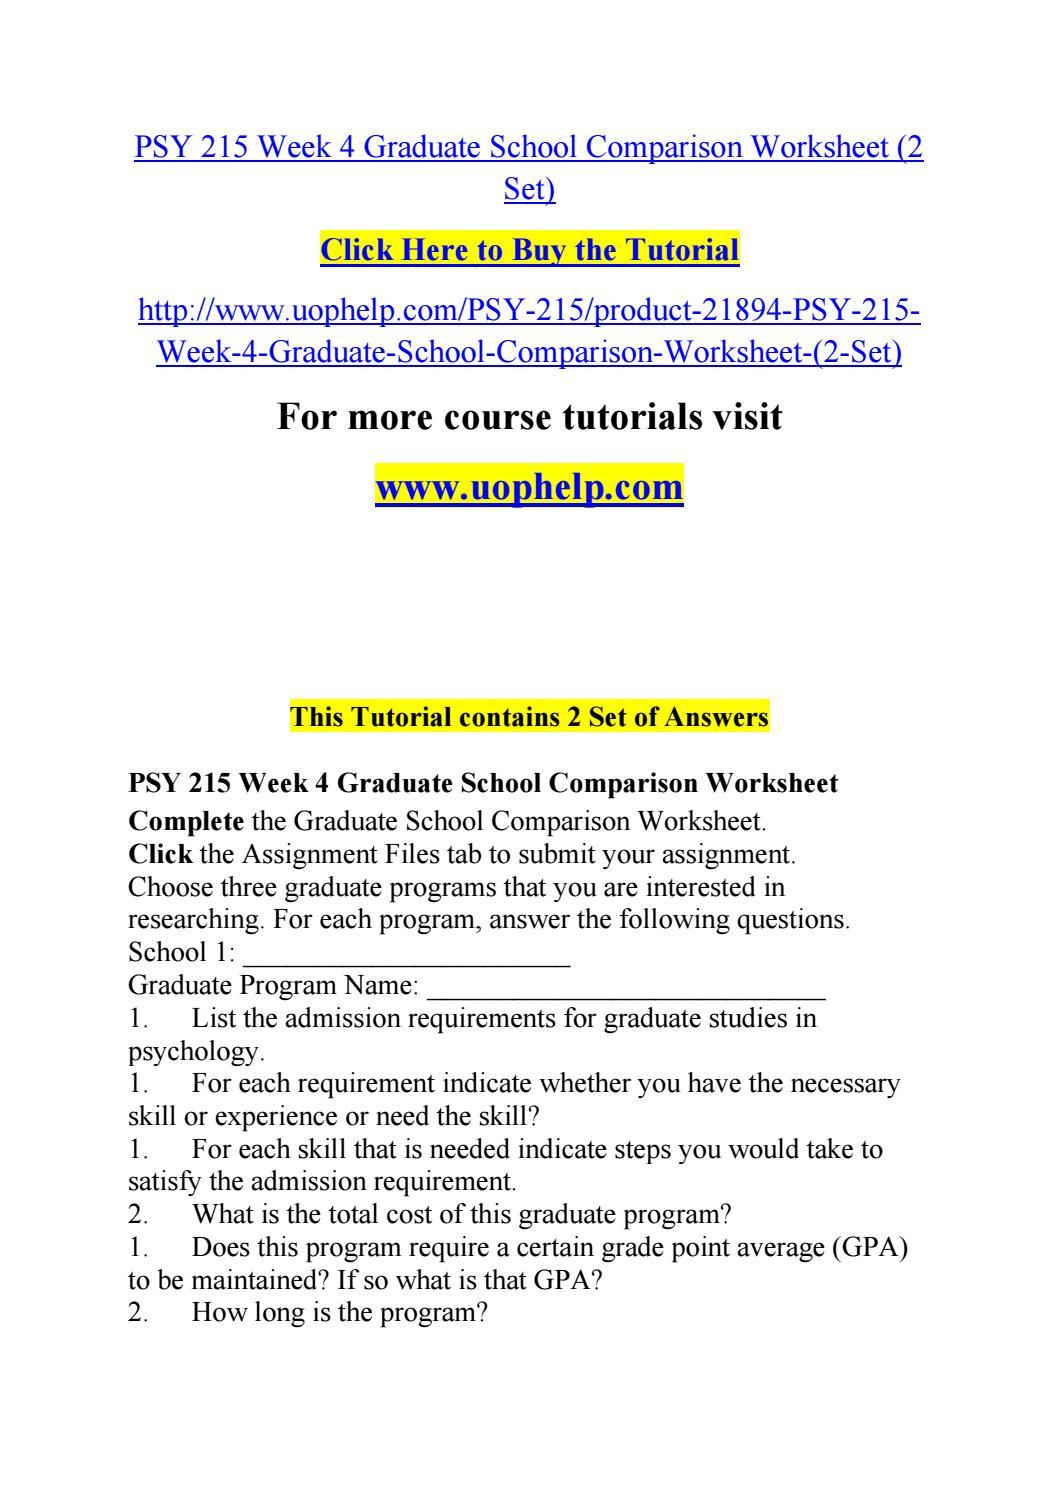 Graduate School Comparison Worksheet